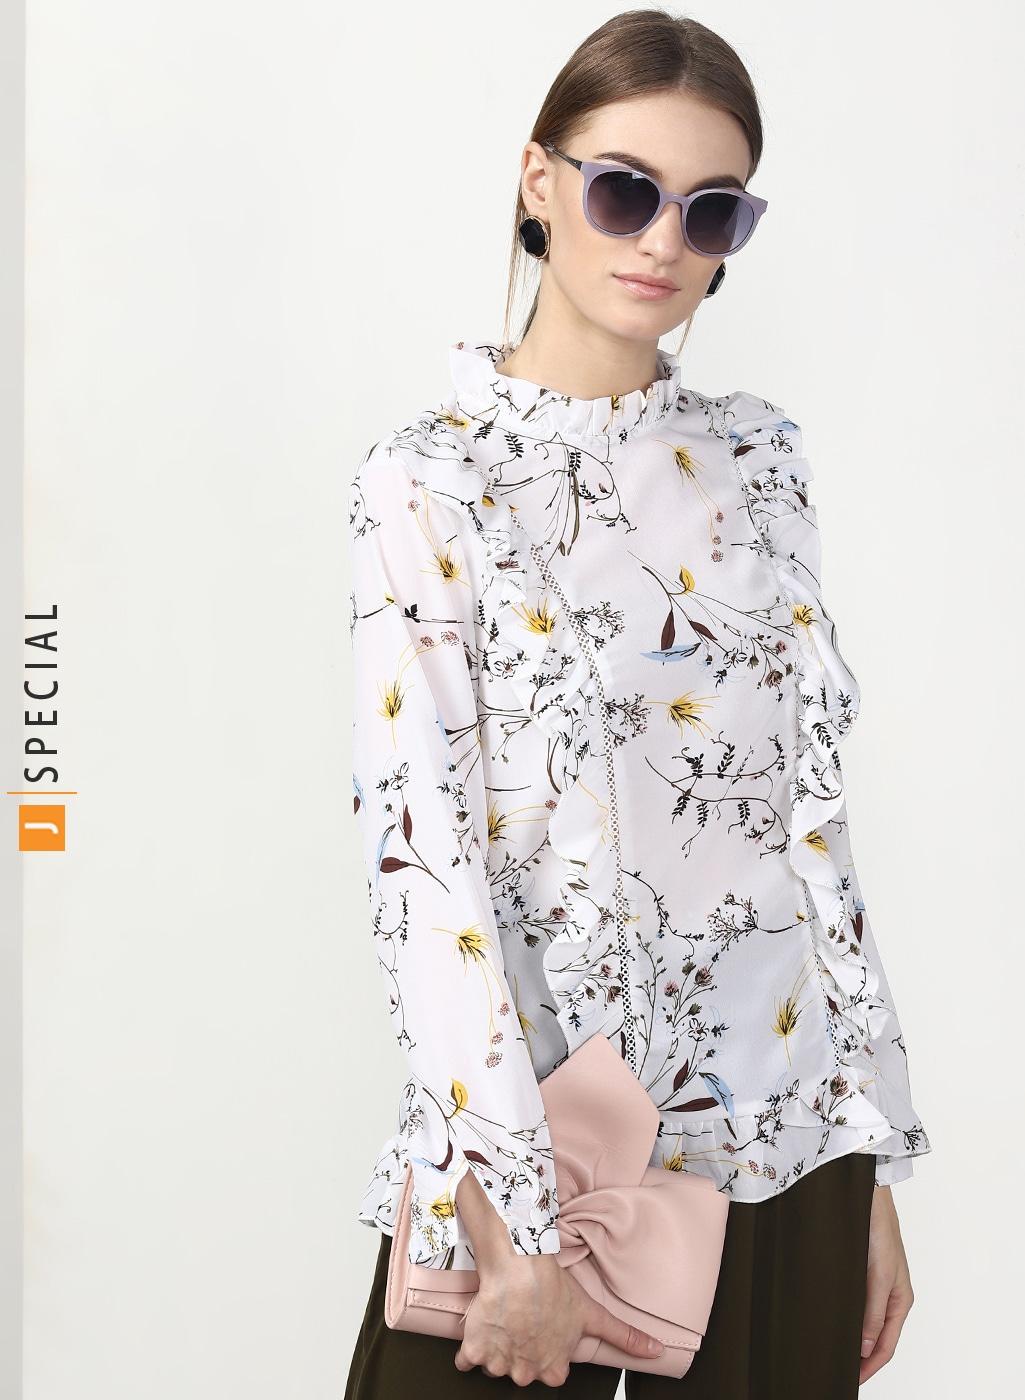 c4172c2e5bbf92 Women Apparel Tops Tees Shirts - Buy Women Apparel Tops Tees Shirts online  in India - Jabong